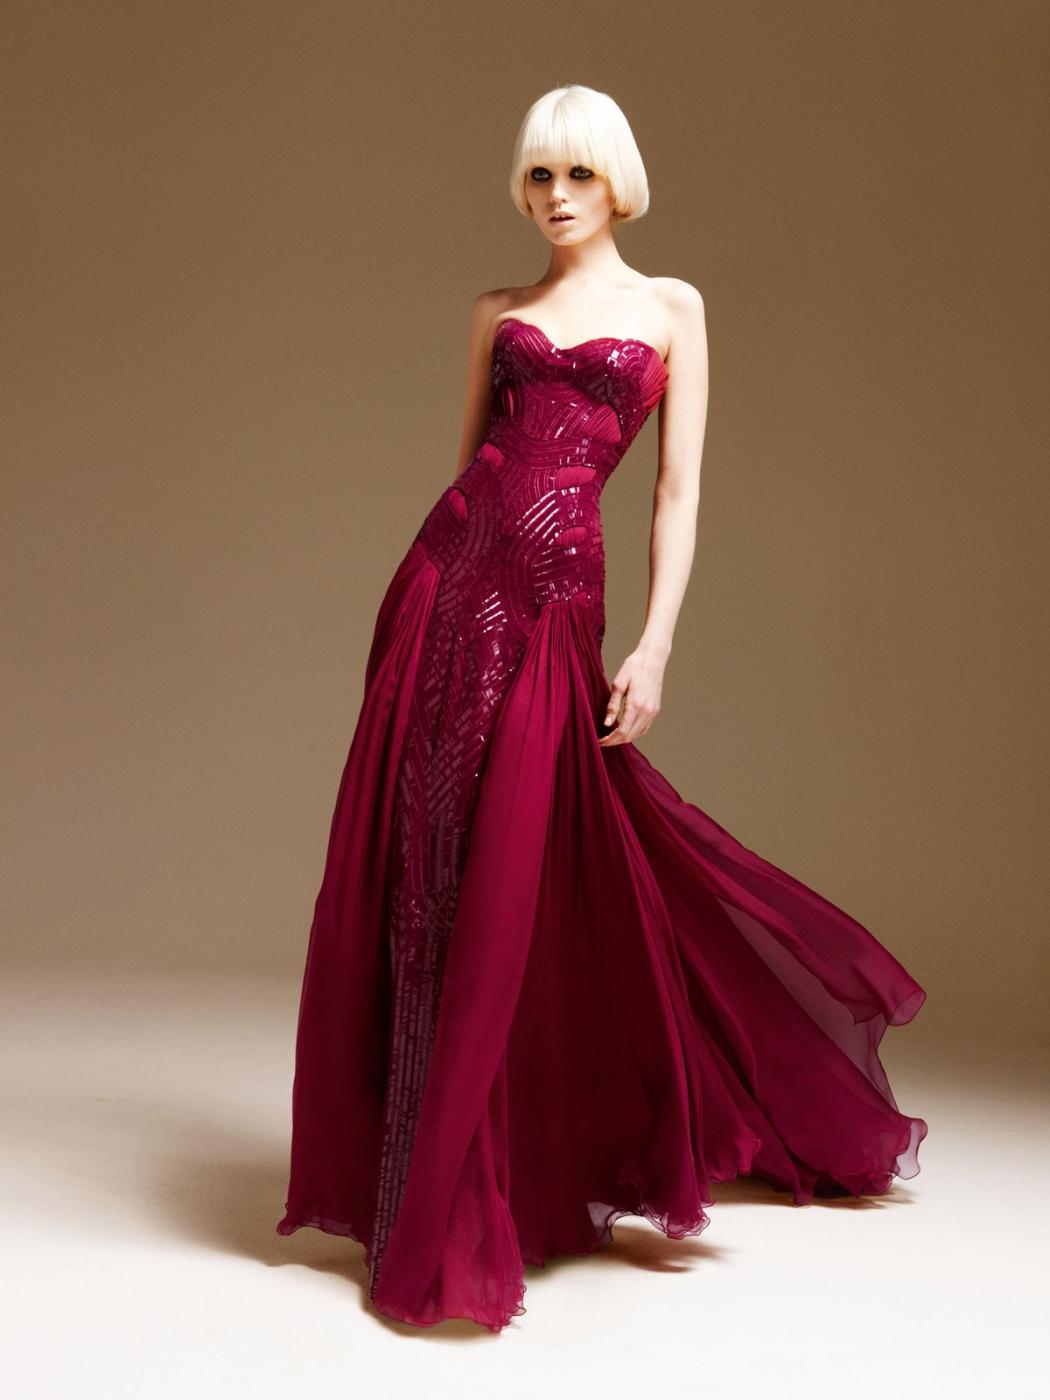 Rooms To Go Mattress >> Versace Dresses Summer 2011